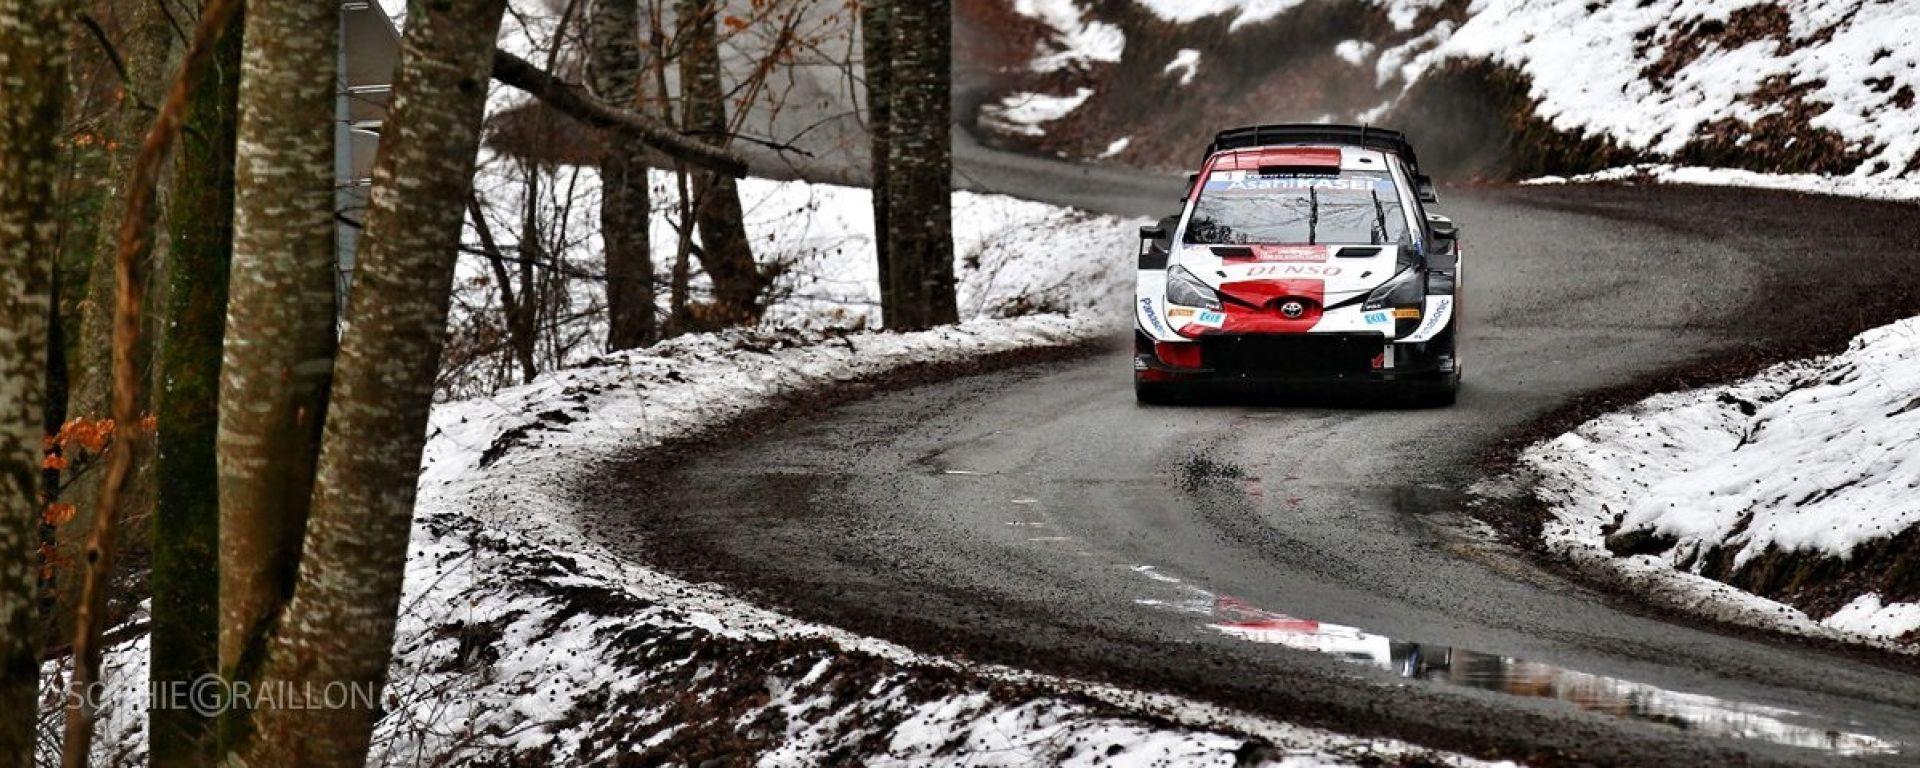 Rally Monte Carlo 2021 - Sebastien Ogier (Toyota Yatis WRC)